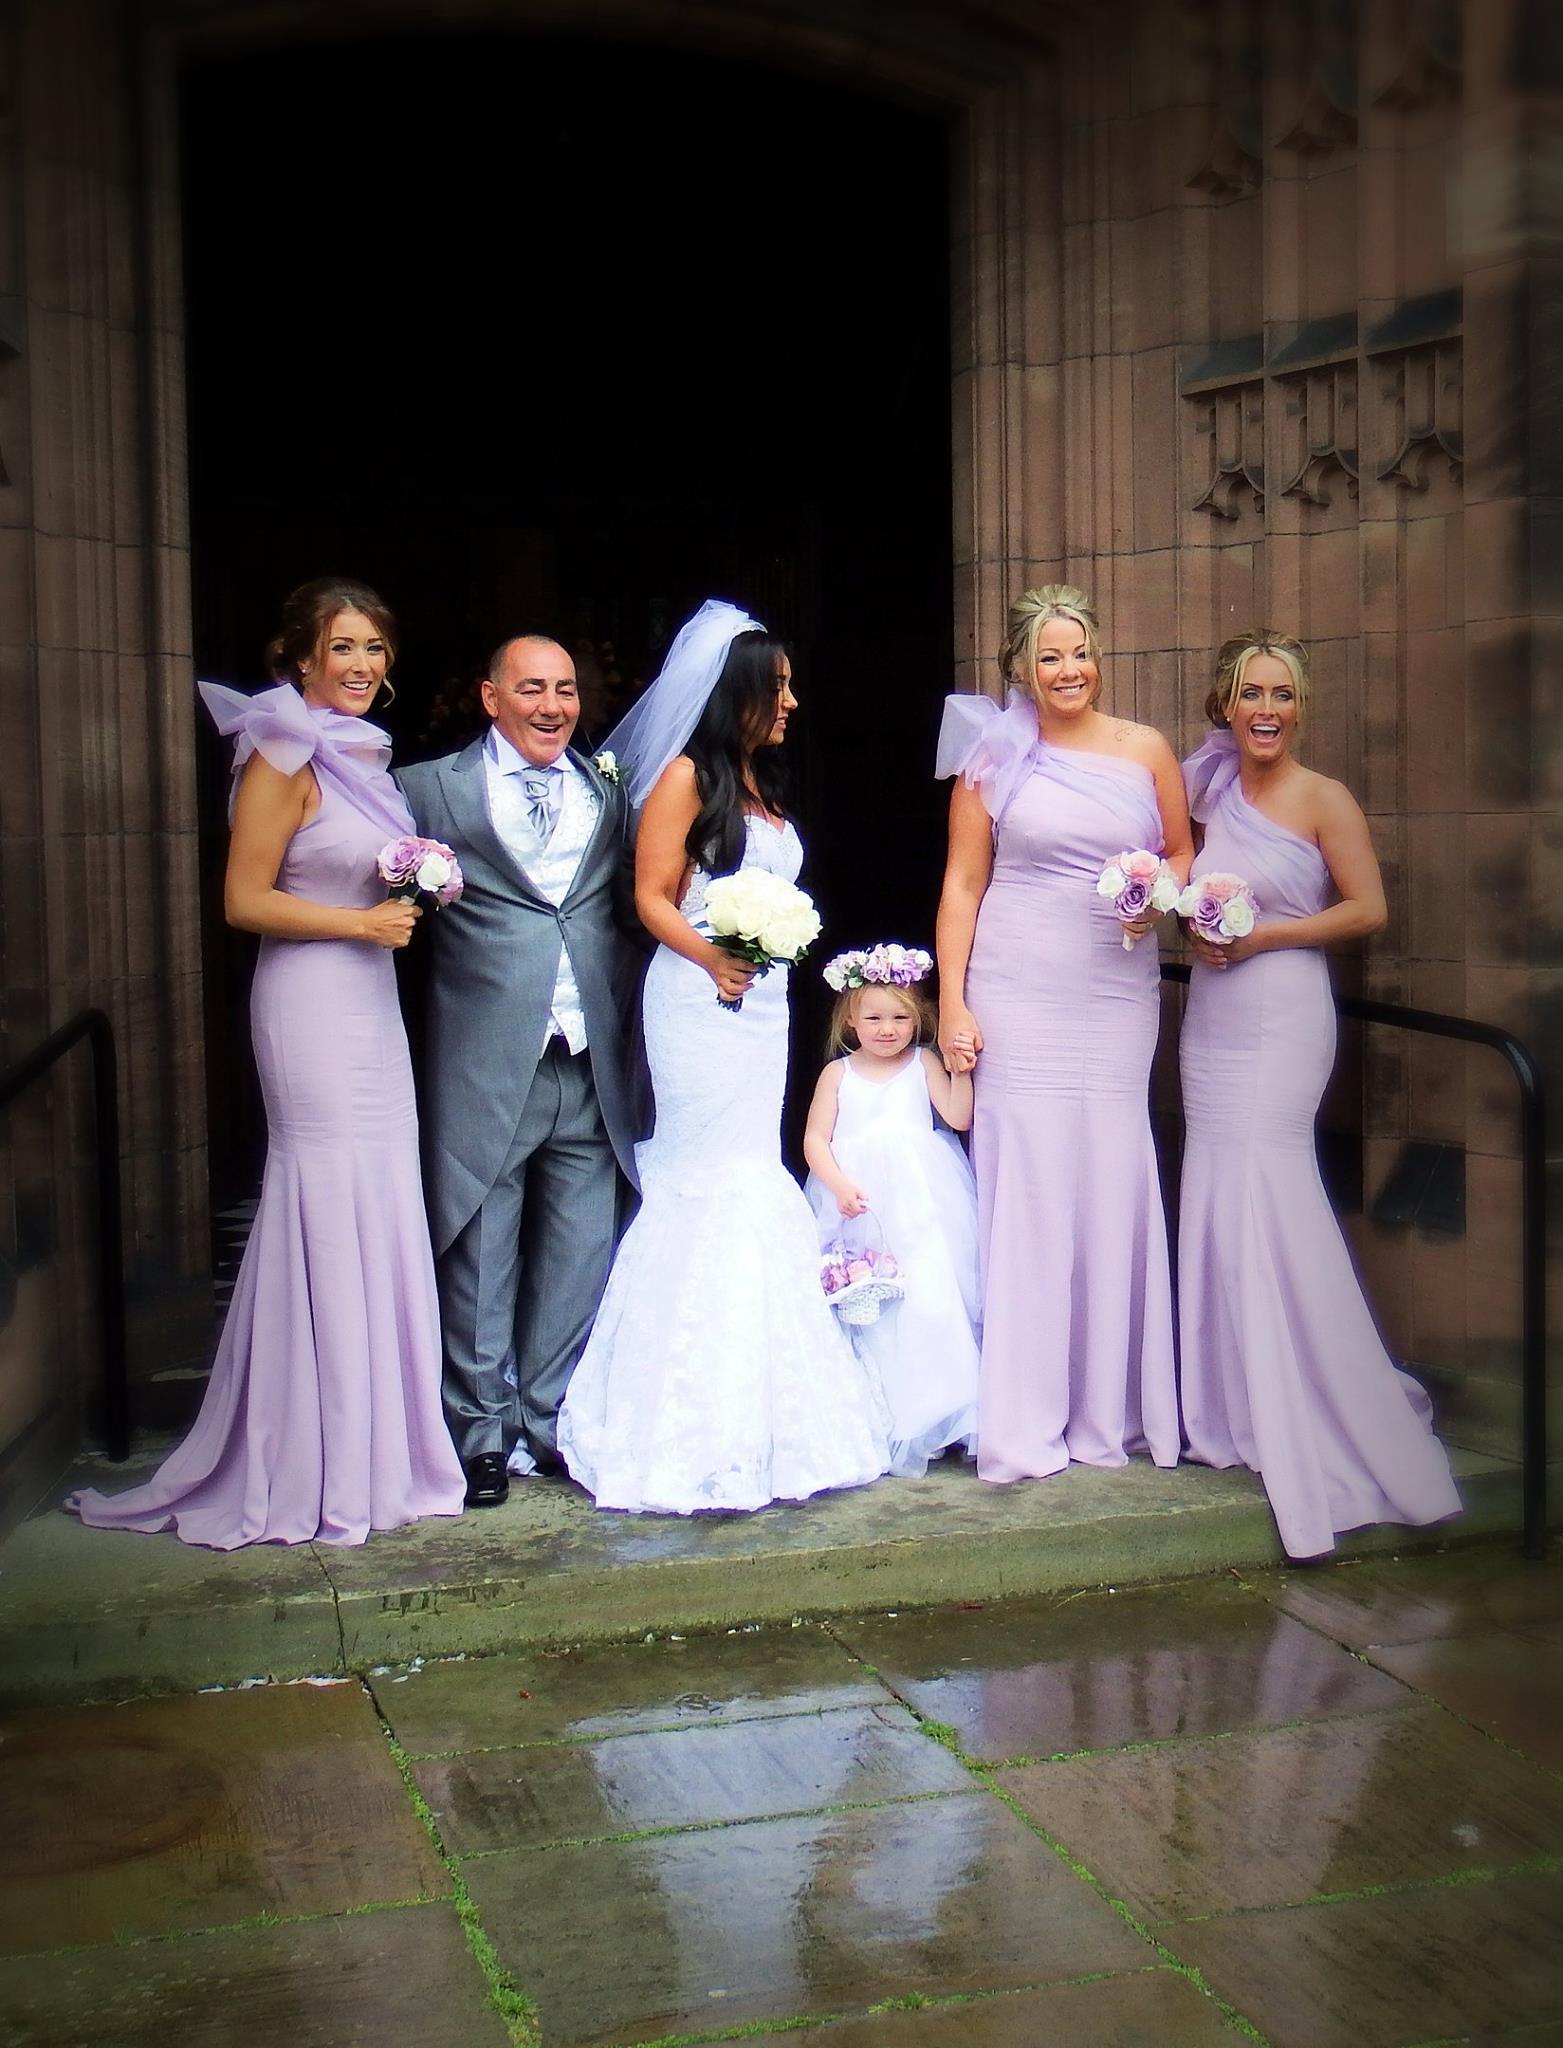 kirsty doyle bespoke bridesmaids lilac wedding dress Claire Bassnett s Bespoke Bridesmaids